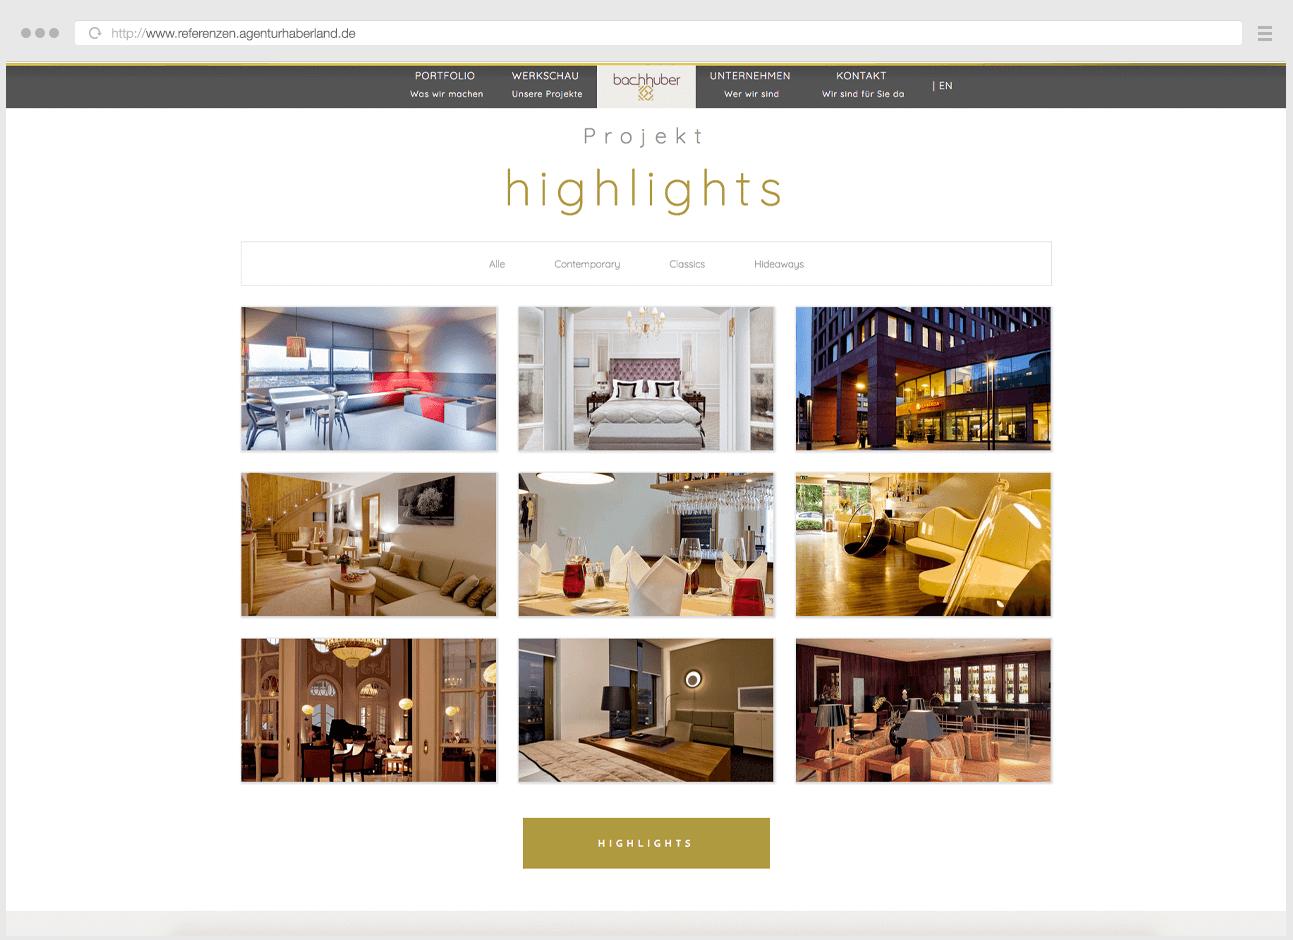 Webdesign Eggenfelden - Haberland - Portfolio Bachhuber - Startseiten - Highlights